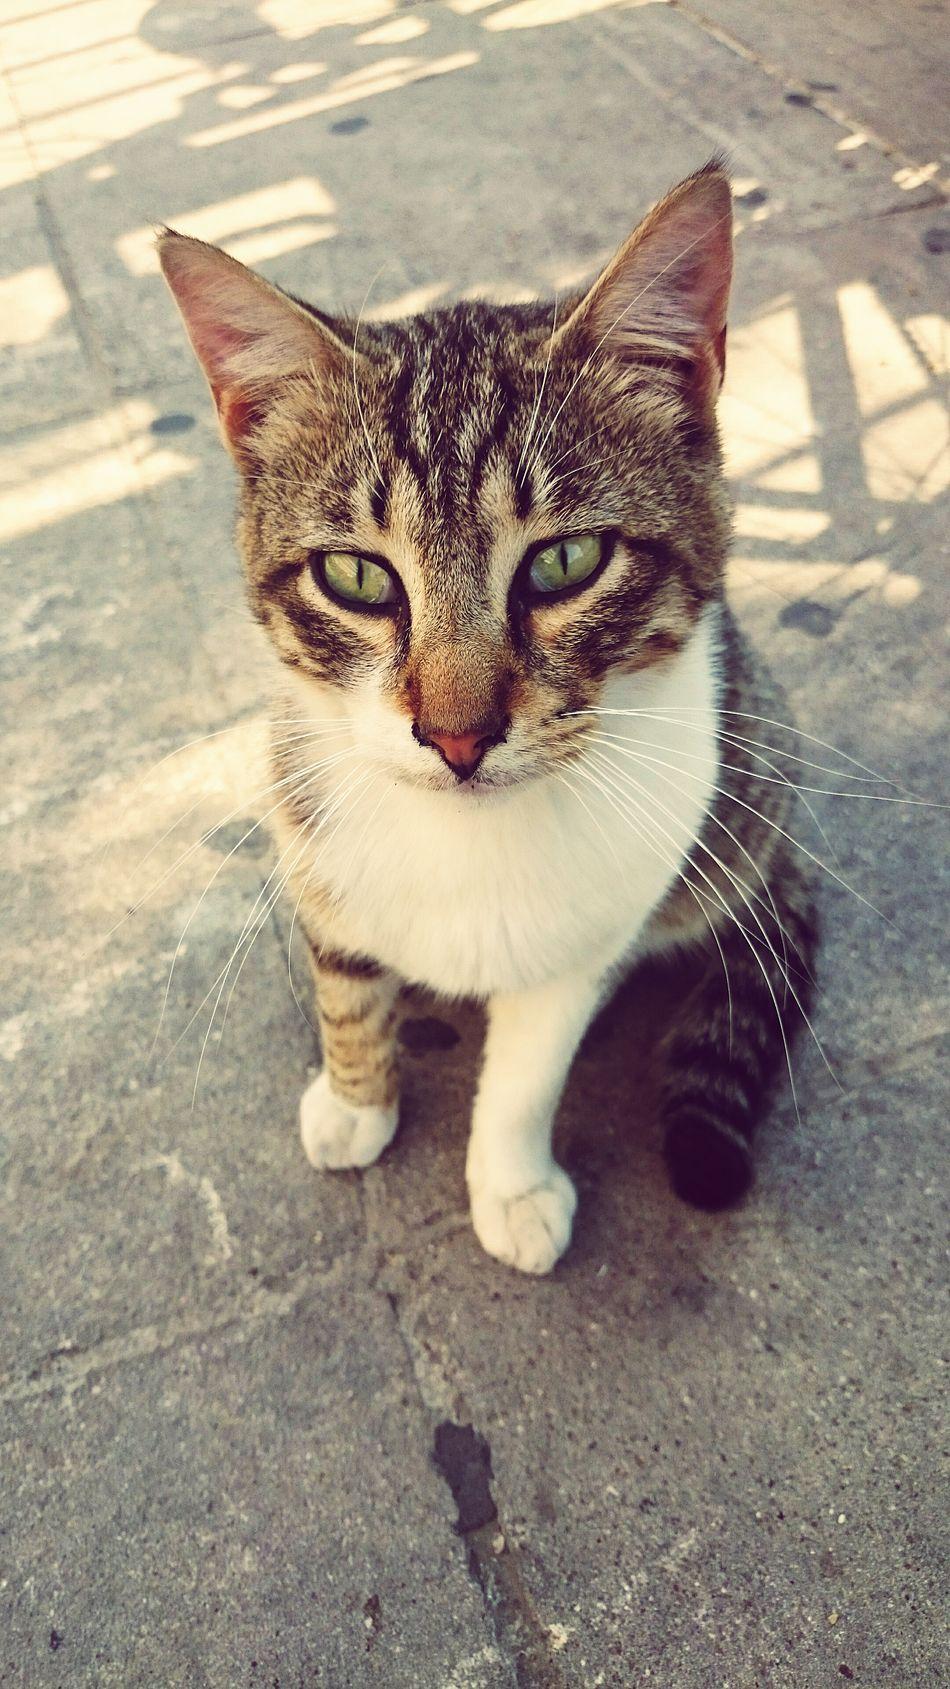 Animal Photography Street Cats Portrait Limassol Cyprus